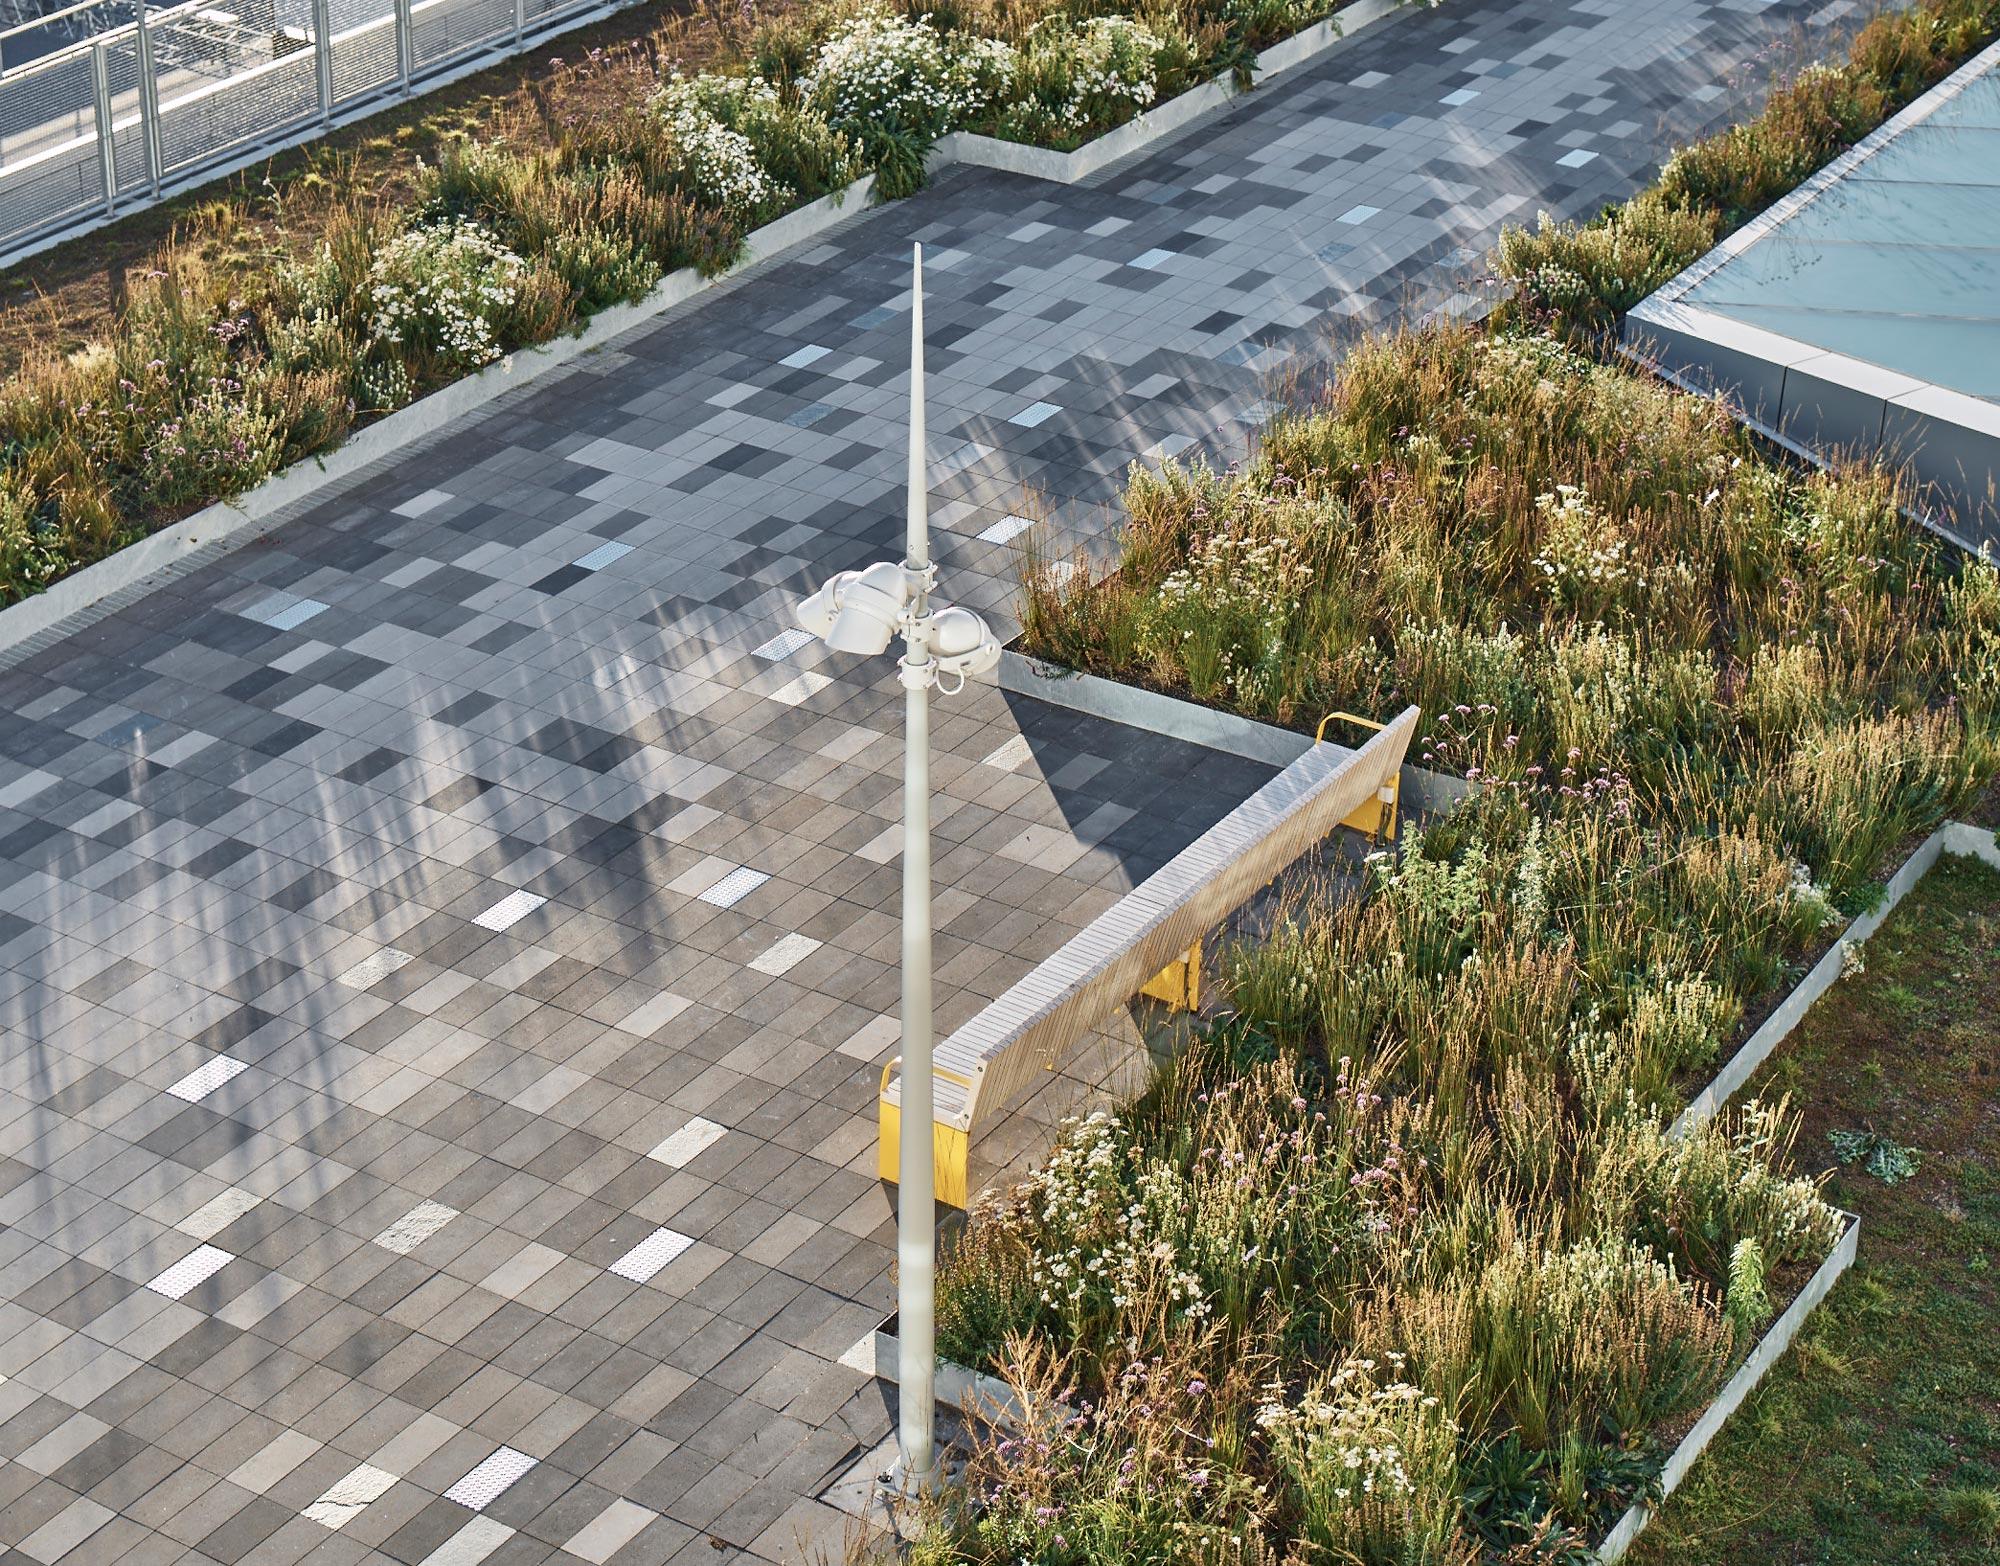 Stockholm Roof Garden Ferry Terminal 09 Landscape Architecture